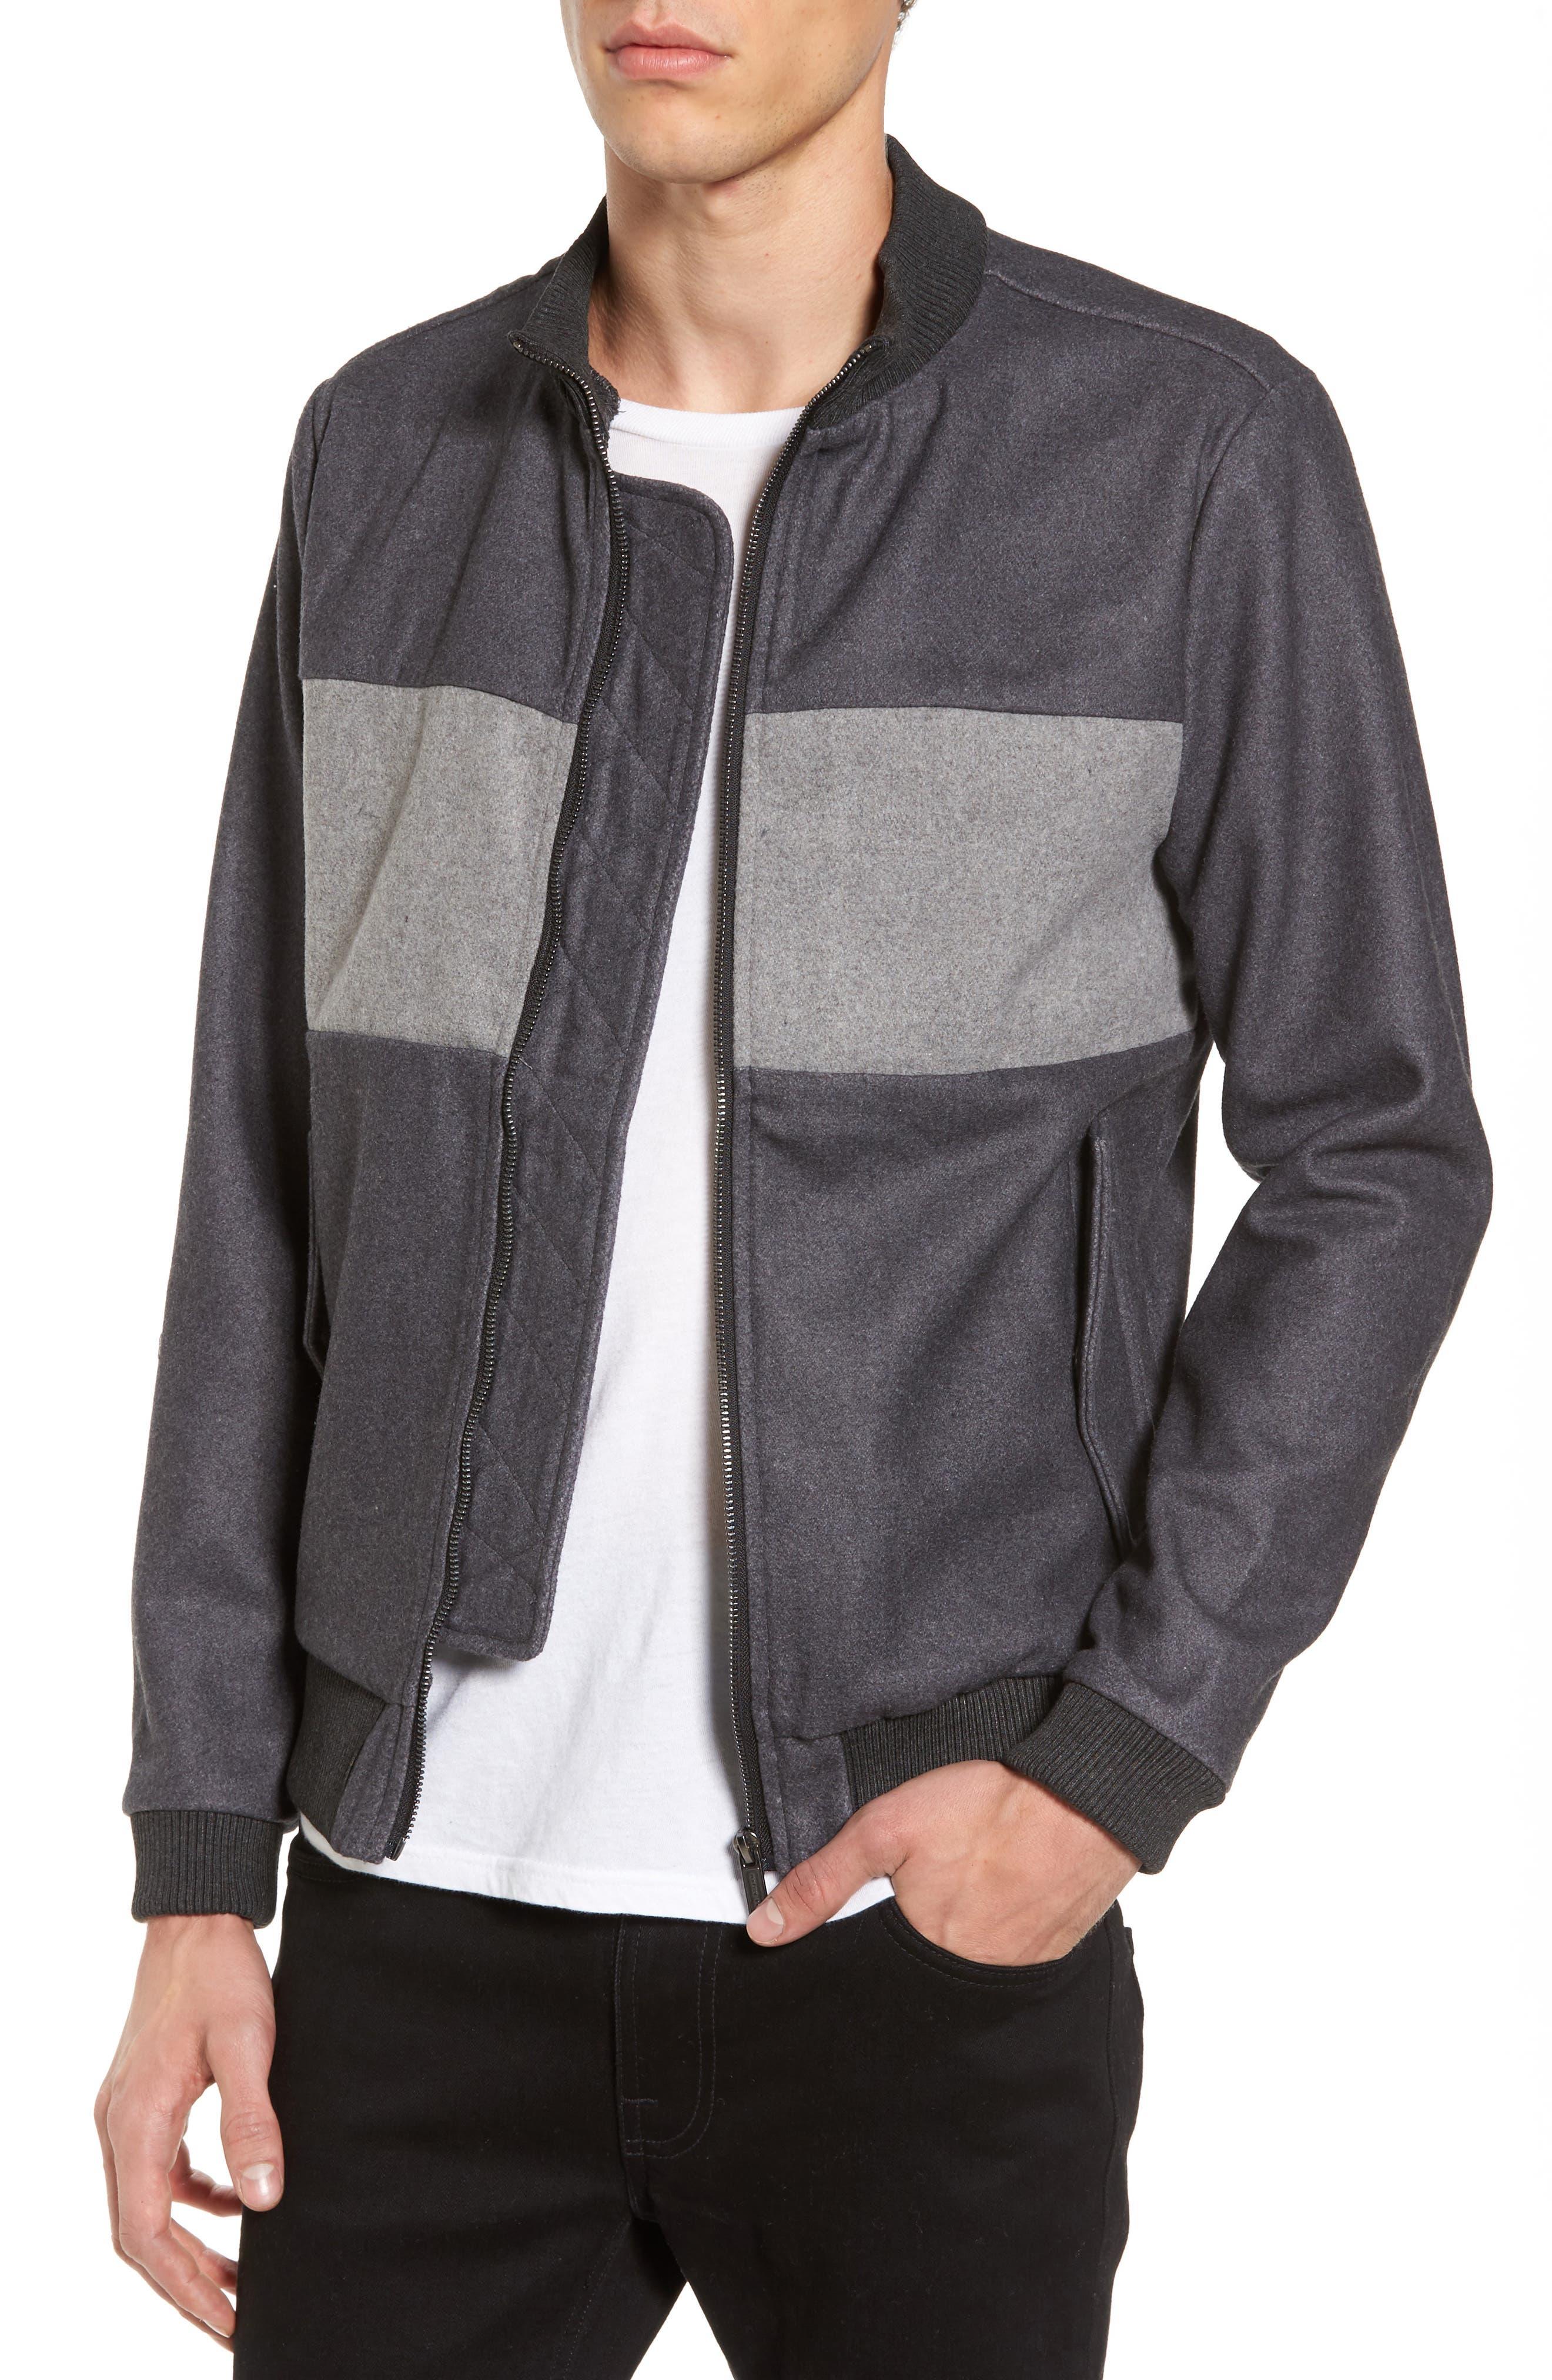 Cityscape Jacket,                         Main,                         color, Charcoal